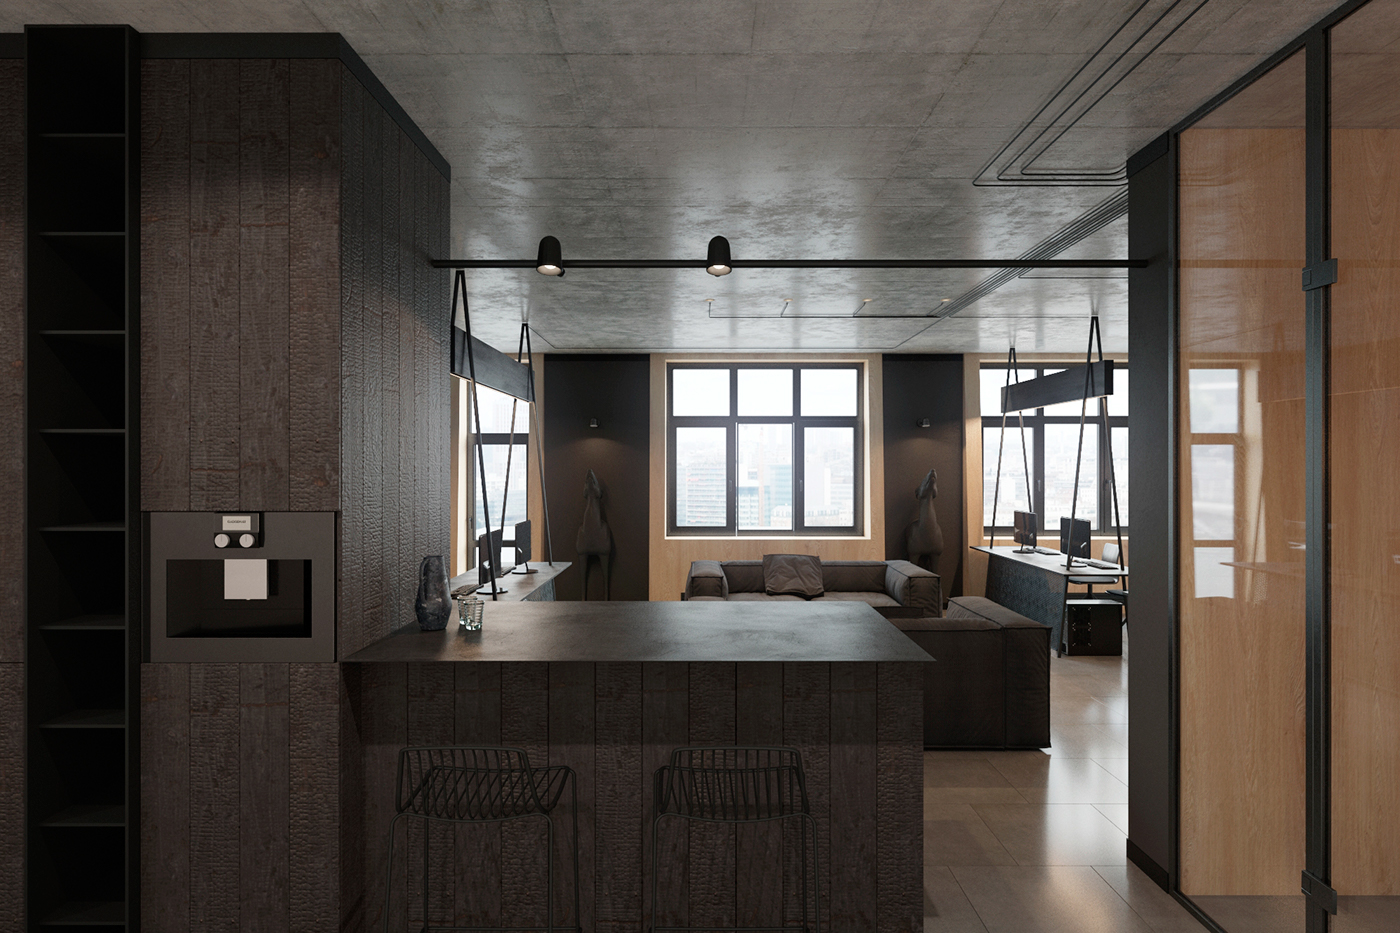 Designs Of The Interior Modern Office Interiorzooi Design Studio On Behance